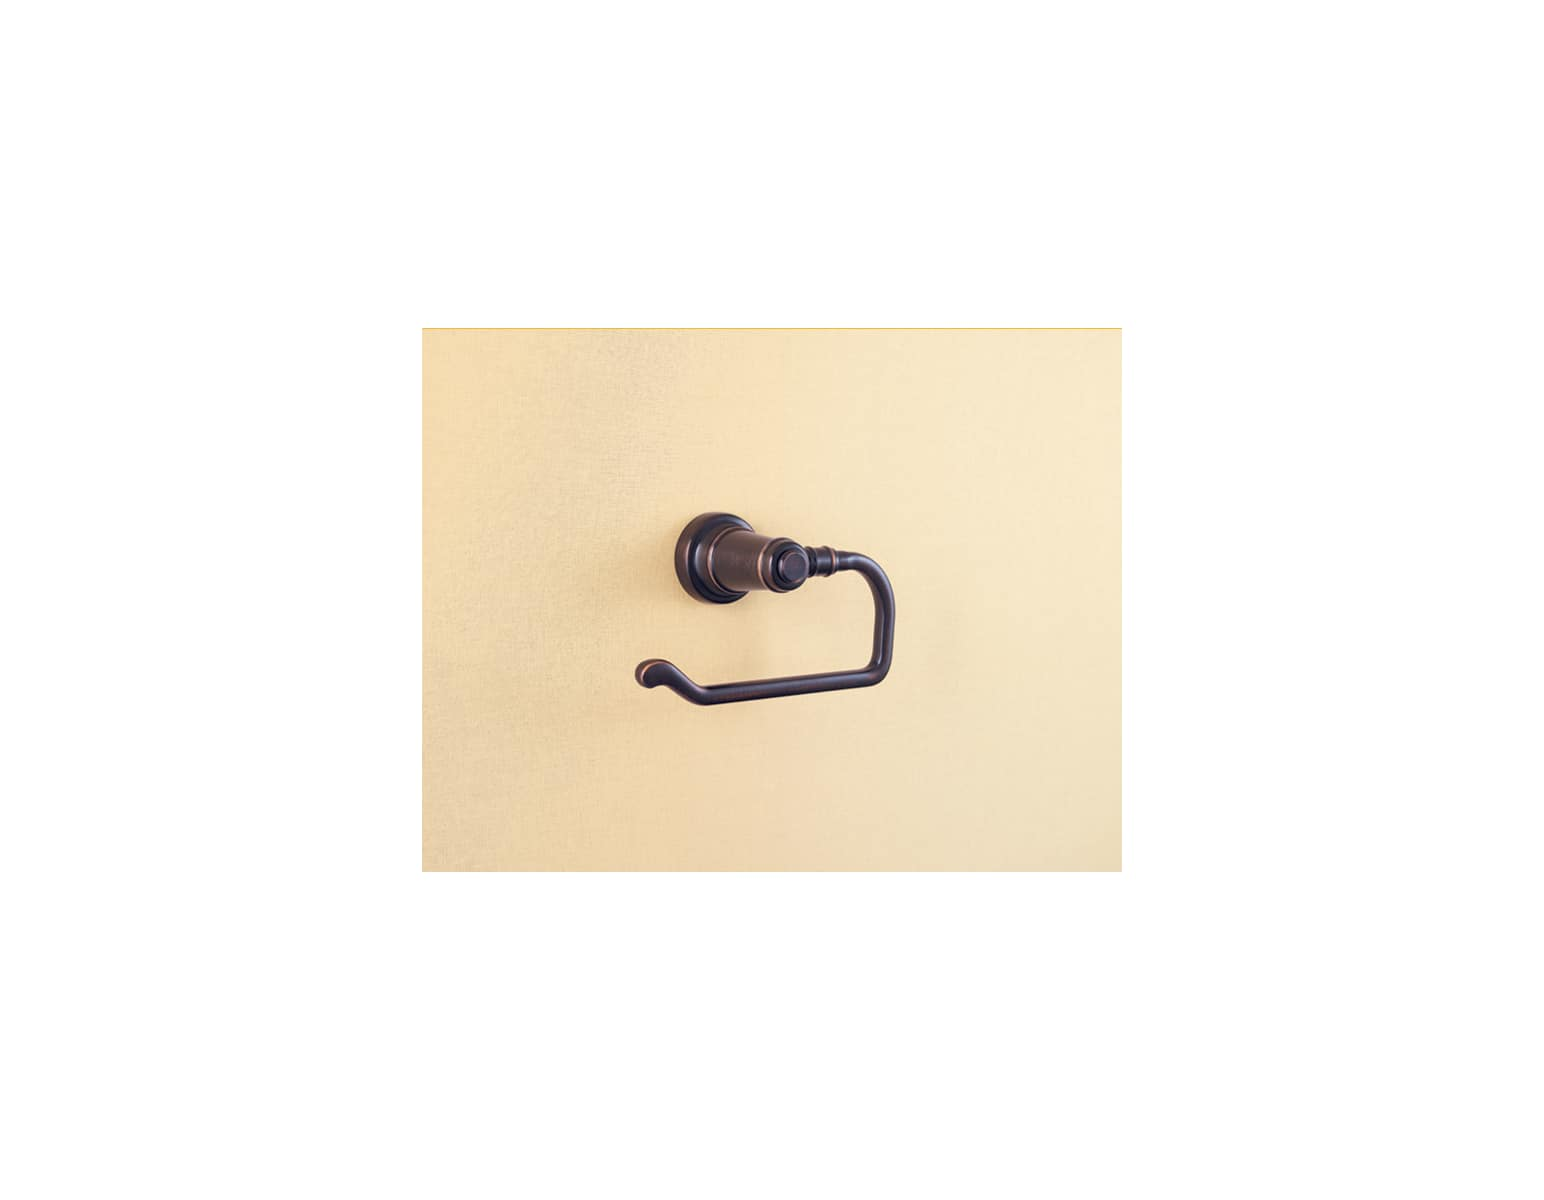 Pfister BPH-YP1U Ashfield Single Post Toilet Paper Holder in Rustic Bronze